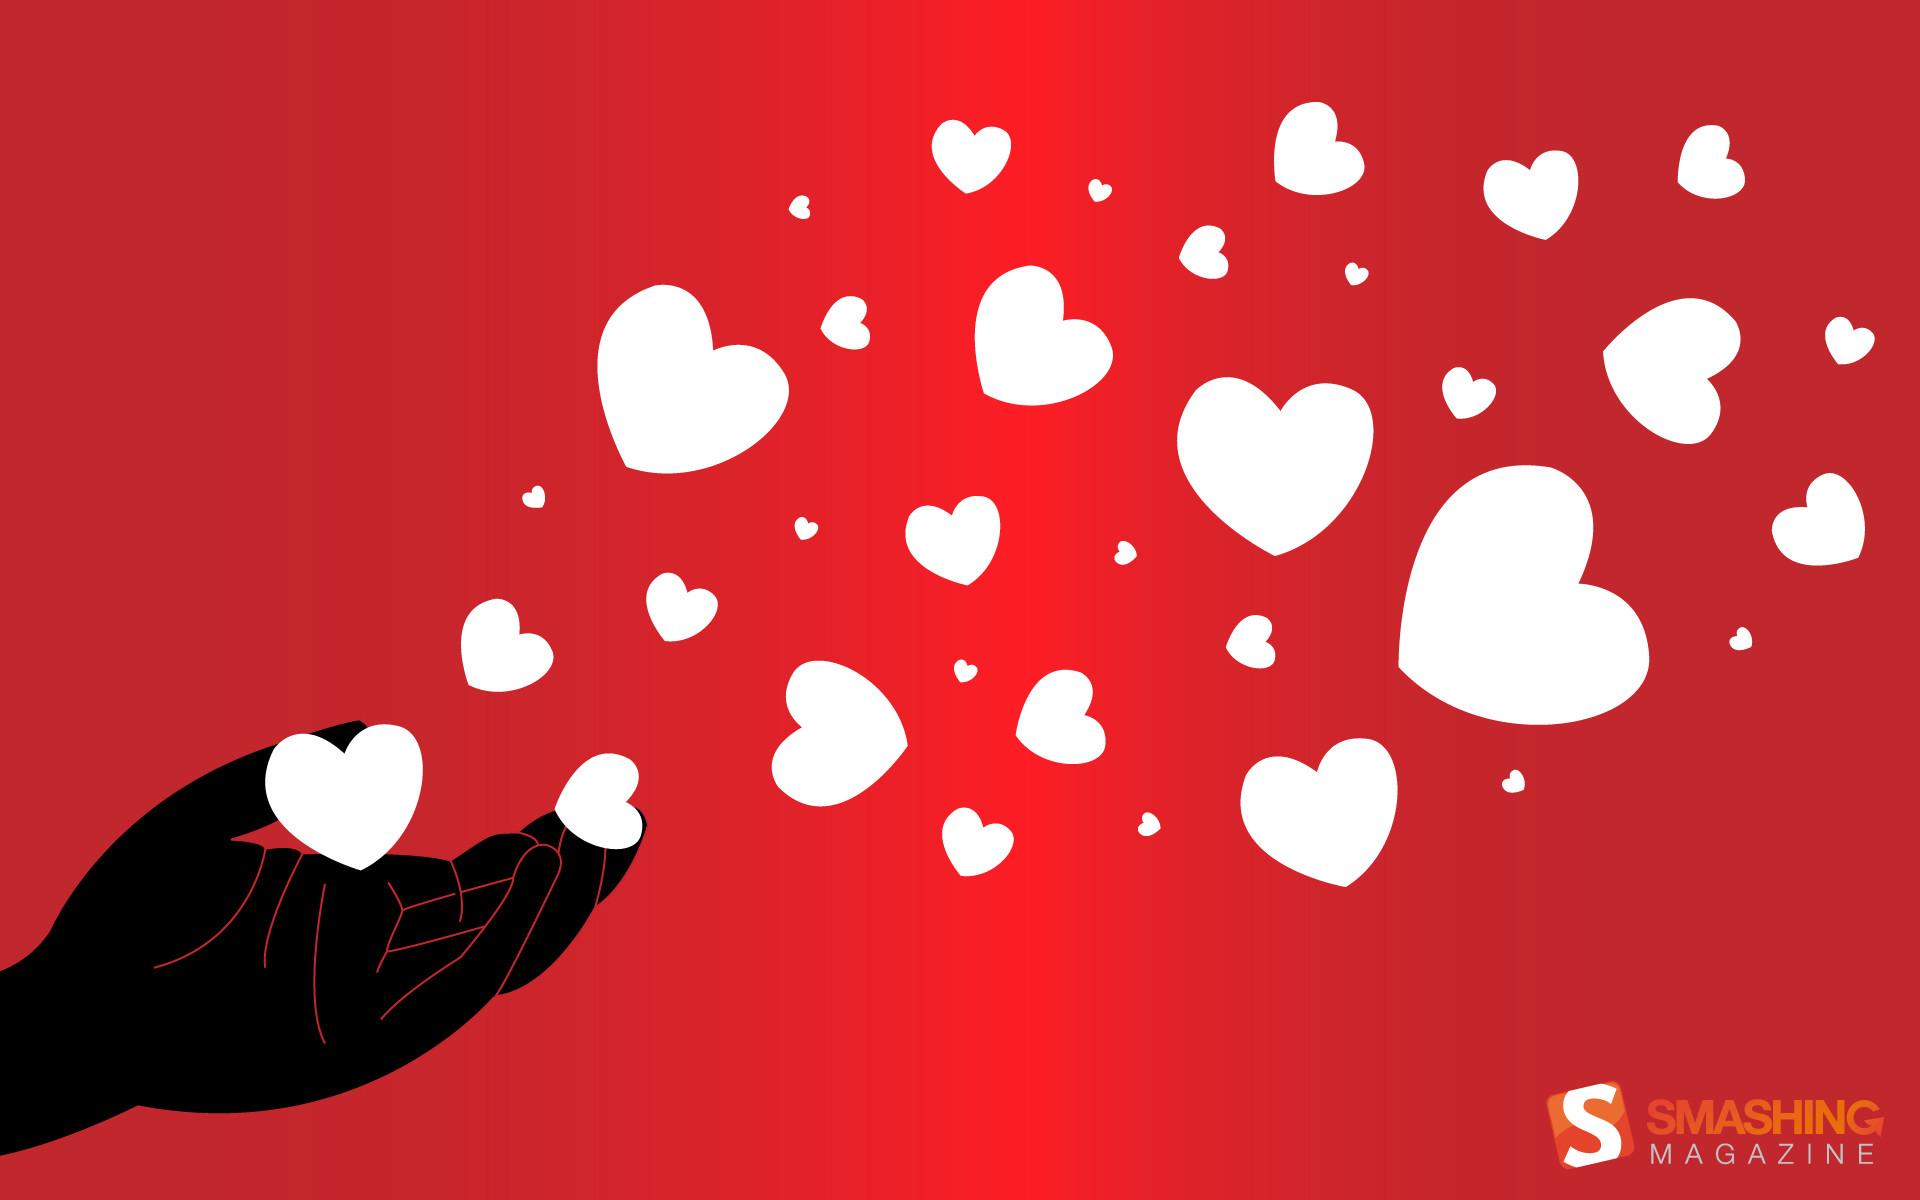 Valentine hearts wallpaper wallpapertag - Valentines day background wallpaper ...